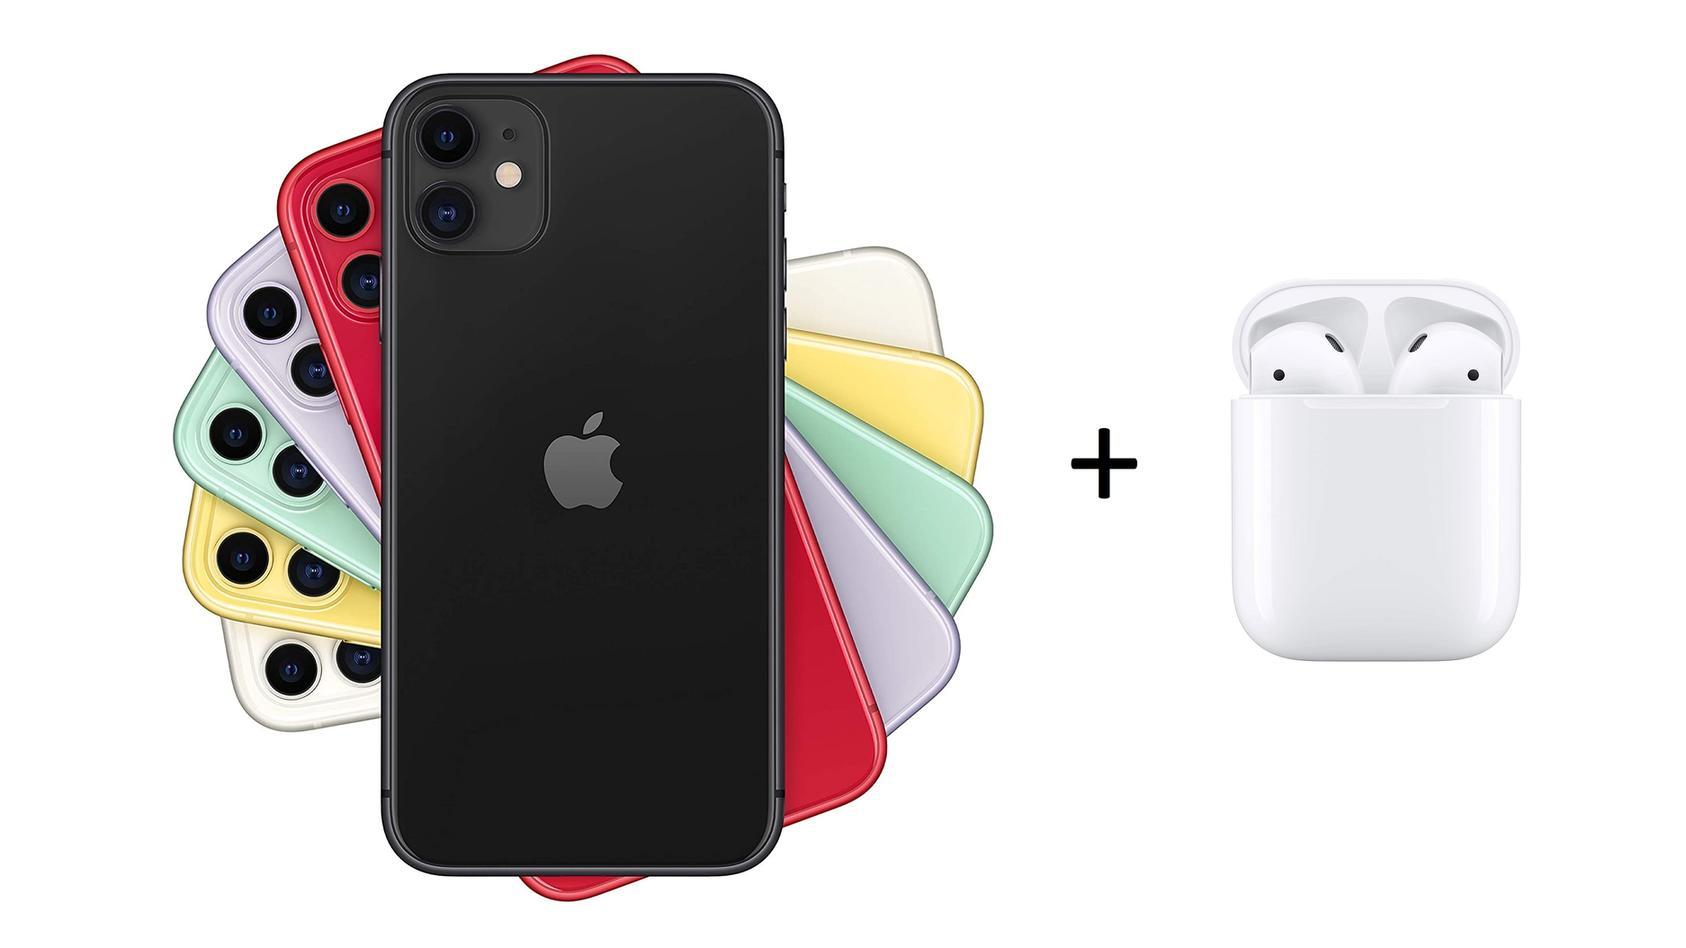 O2 bietet das iPhone 11 mit AirPods samt Allnet-Flat an.